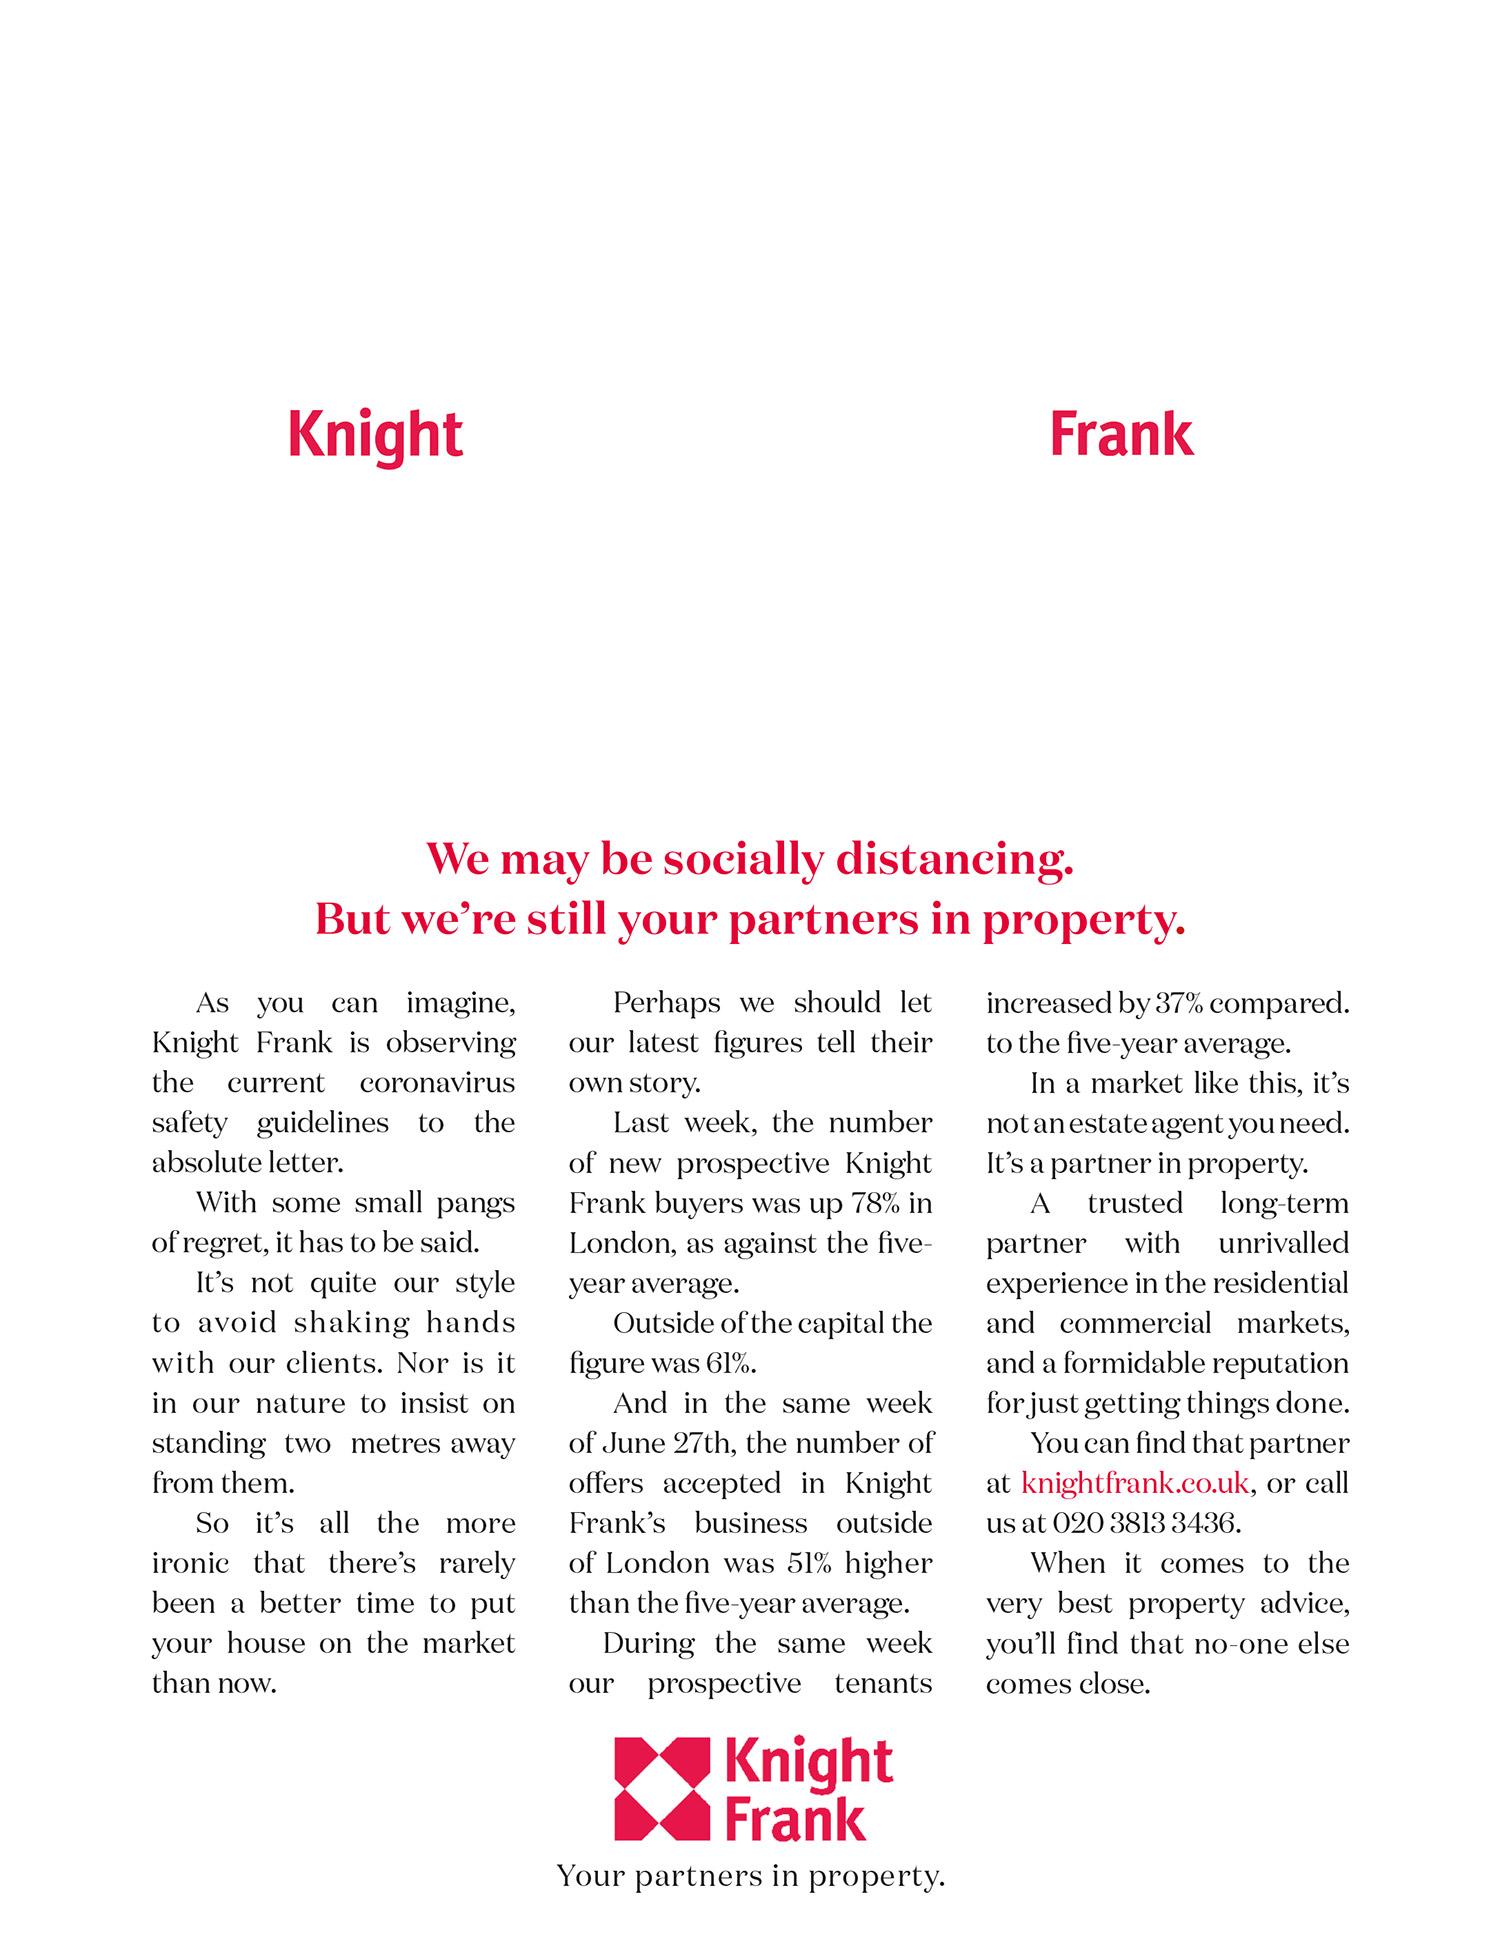 Knight Frank Social Distancing ad